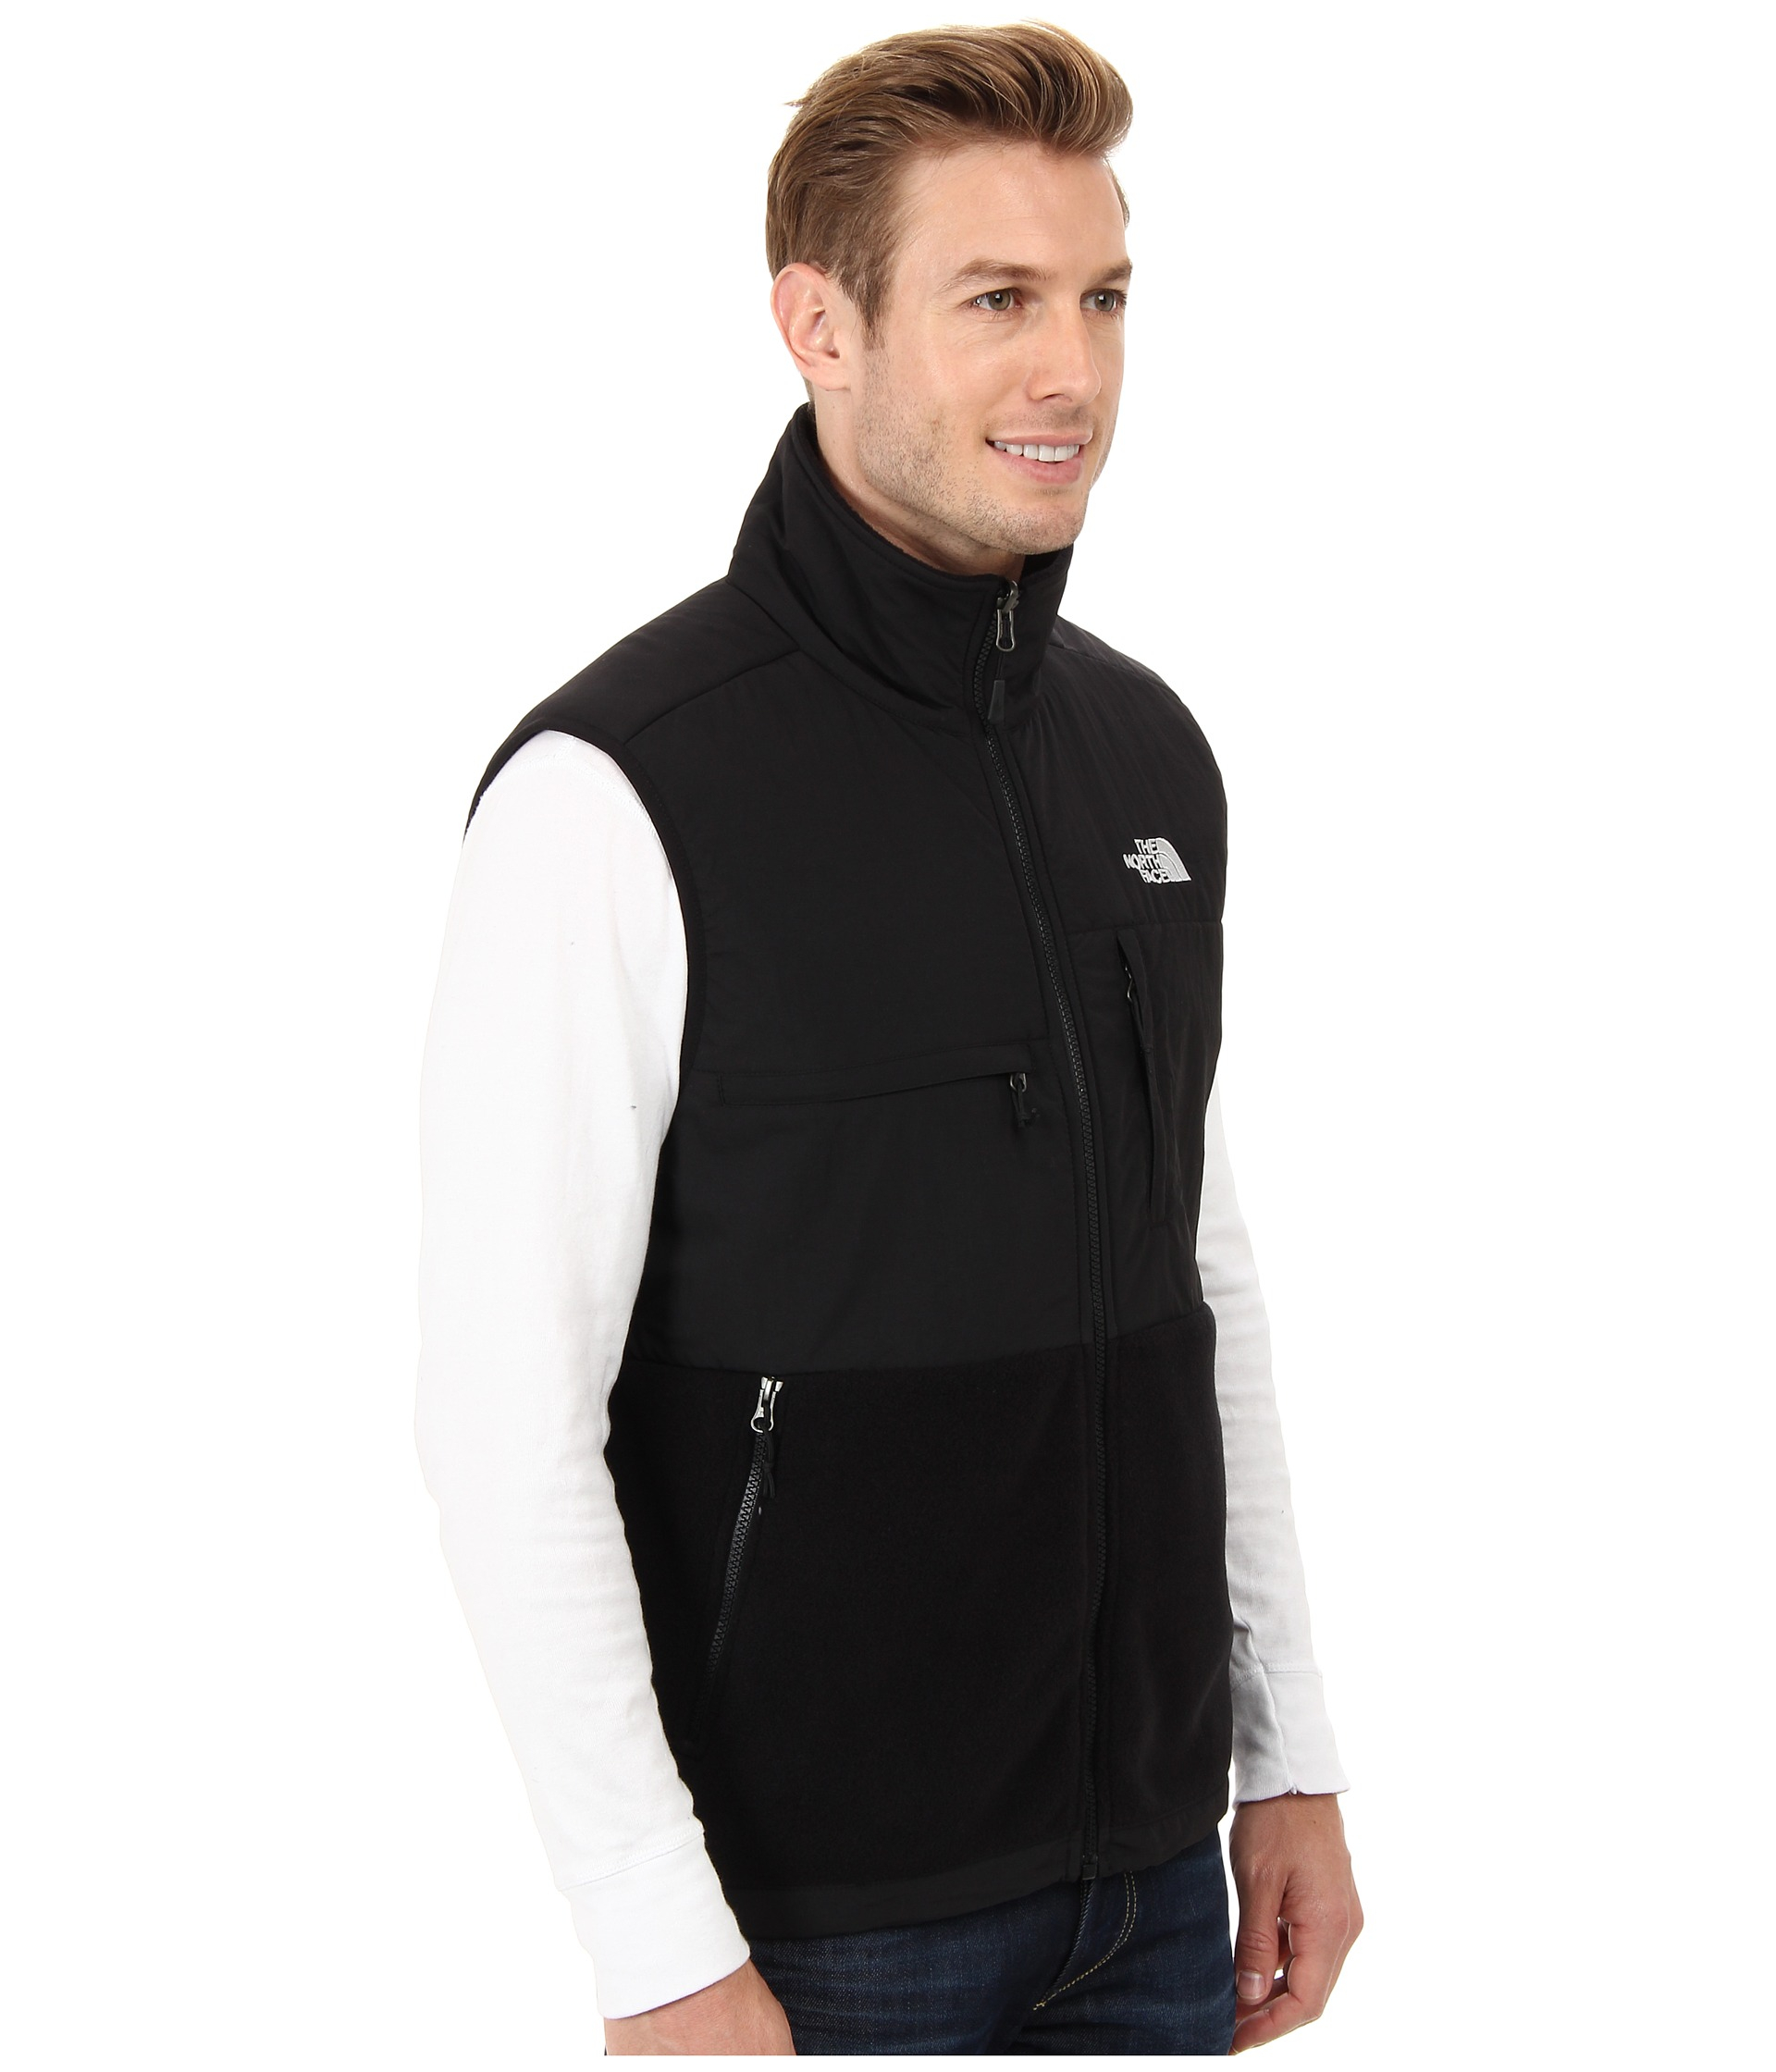 4be5c4a1023b ... jacket 83495 10a5b  best lyst the north face denali vest in black for  men c9801 d00c1